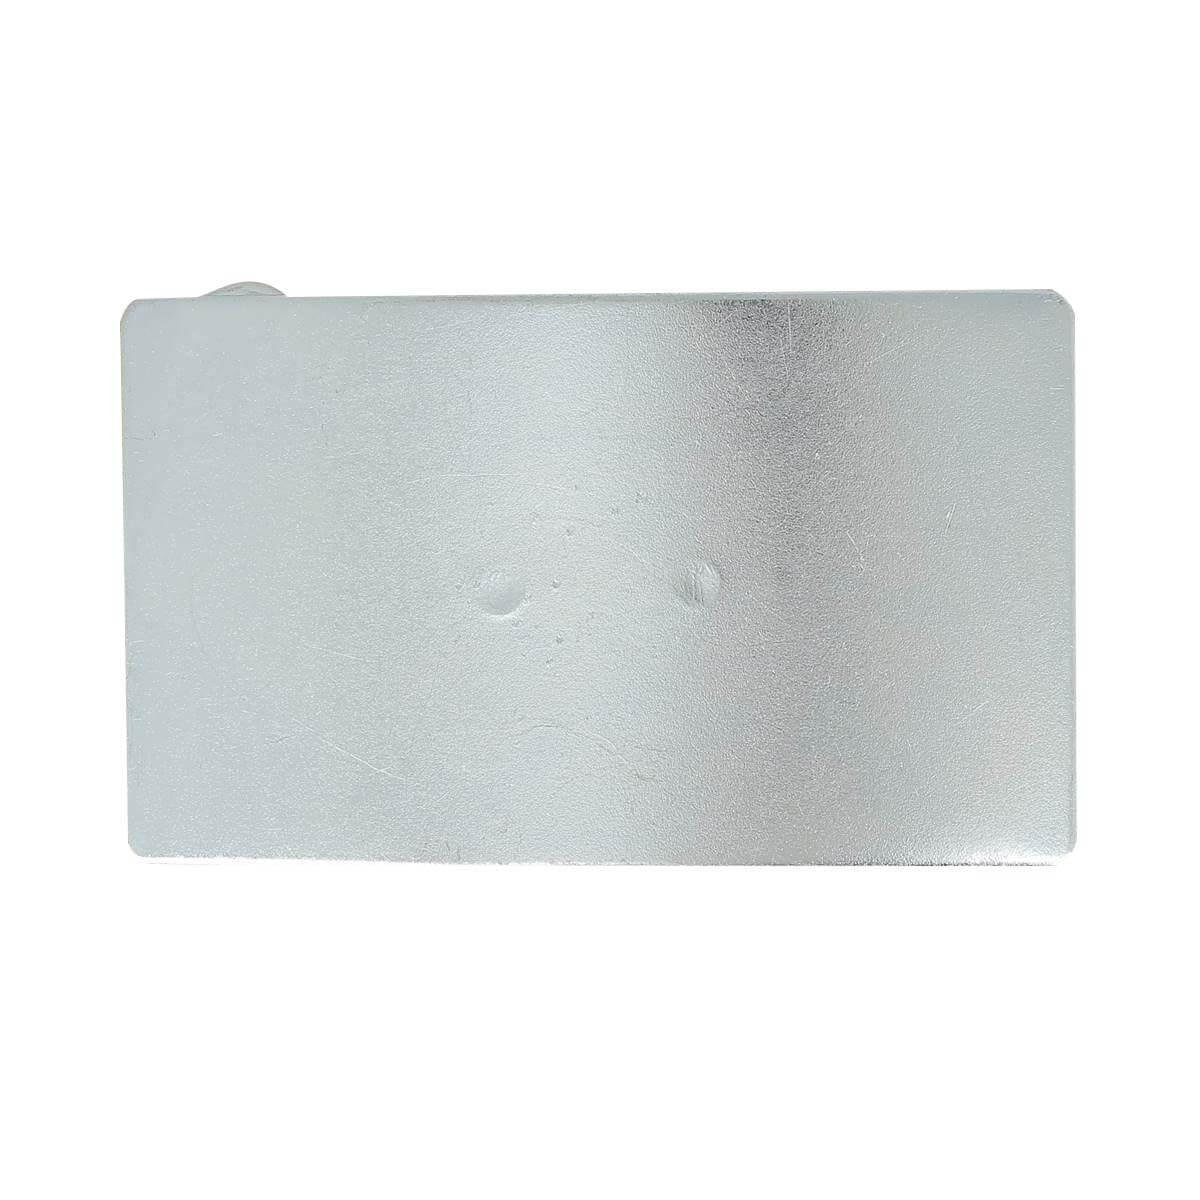 Boucle de ceinturon RECTANGLE - Tandy Leather